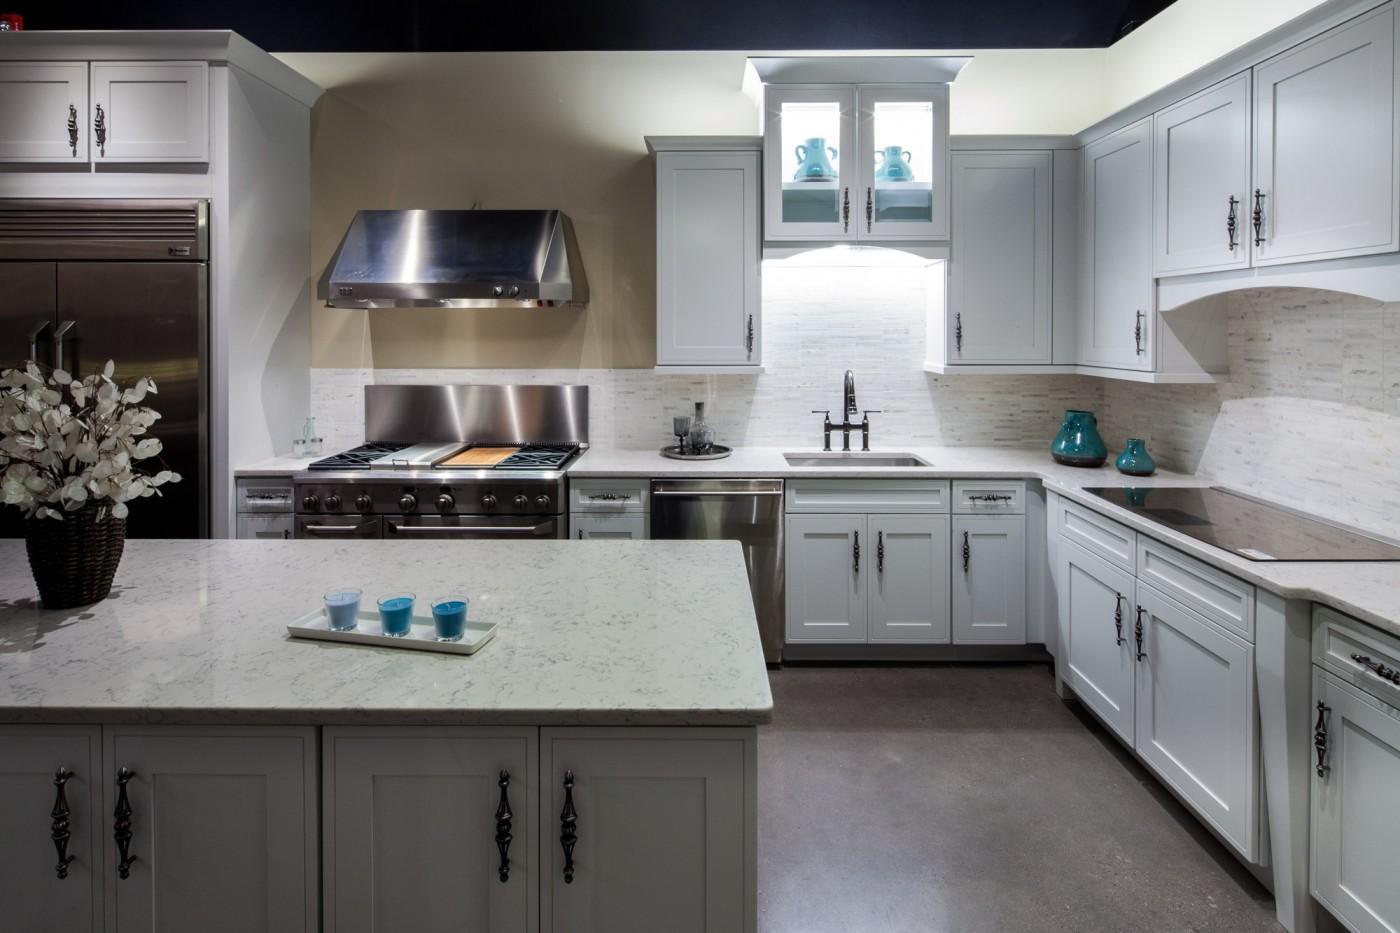 newviewgranite quartz kitchen countertops 3cm Silestone Kitchen with Pencil edge